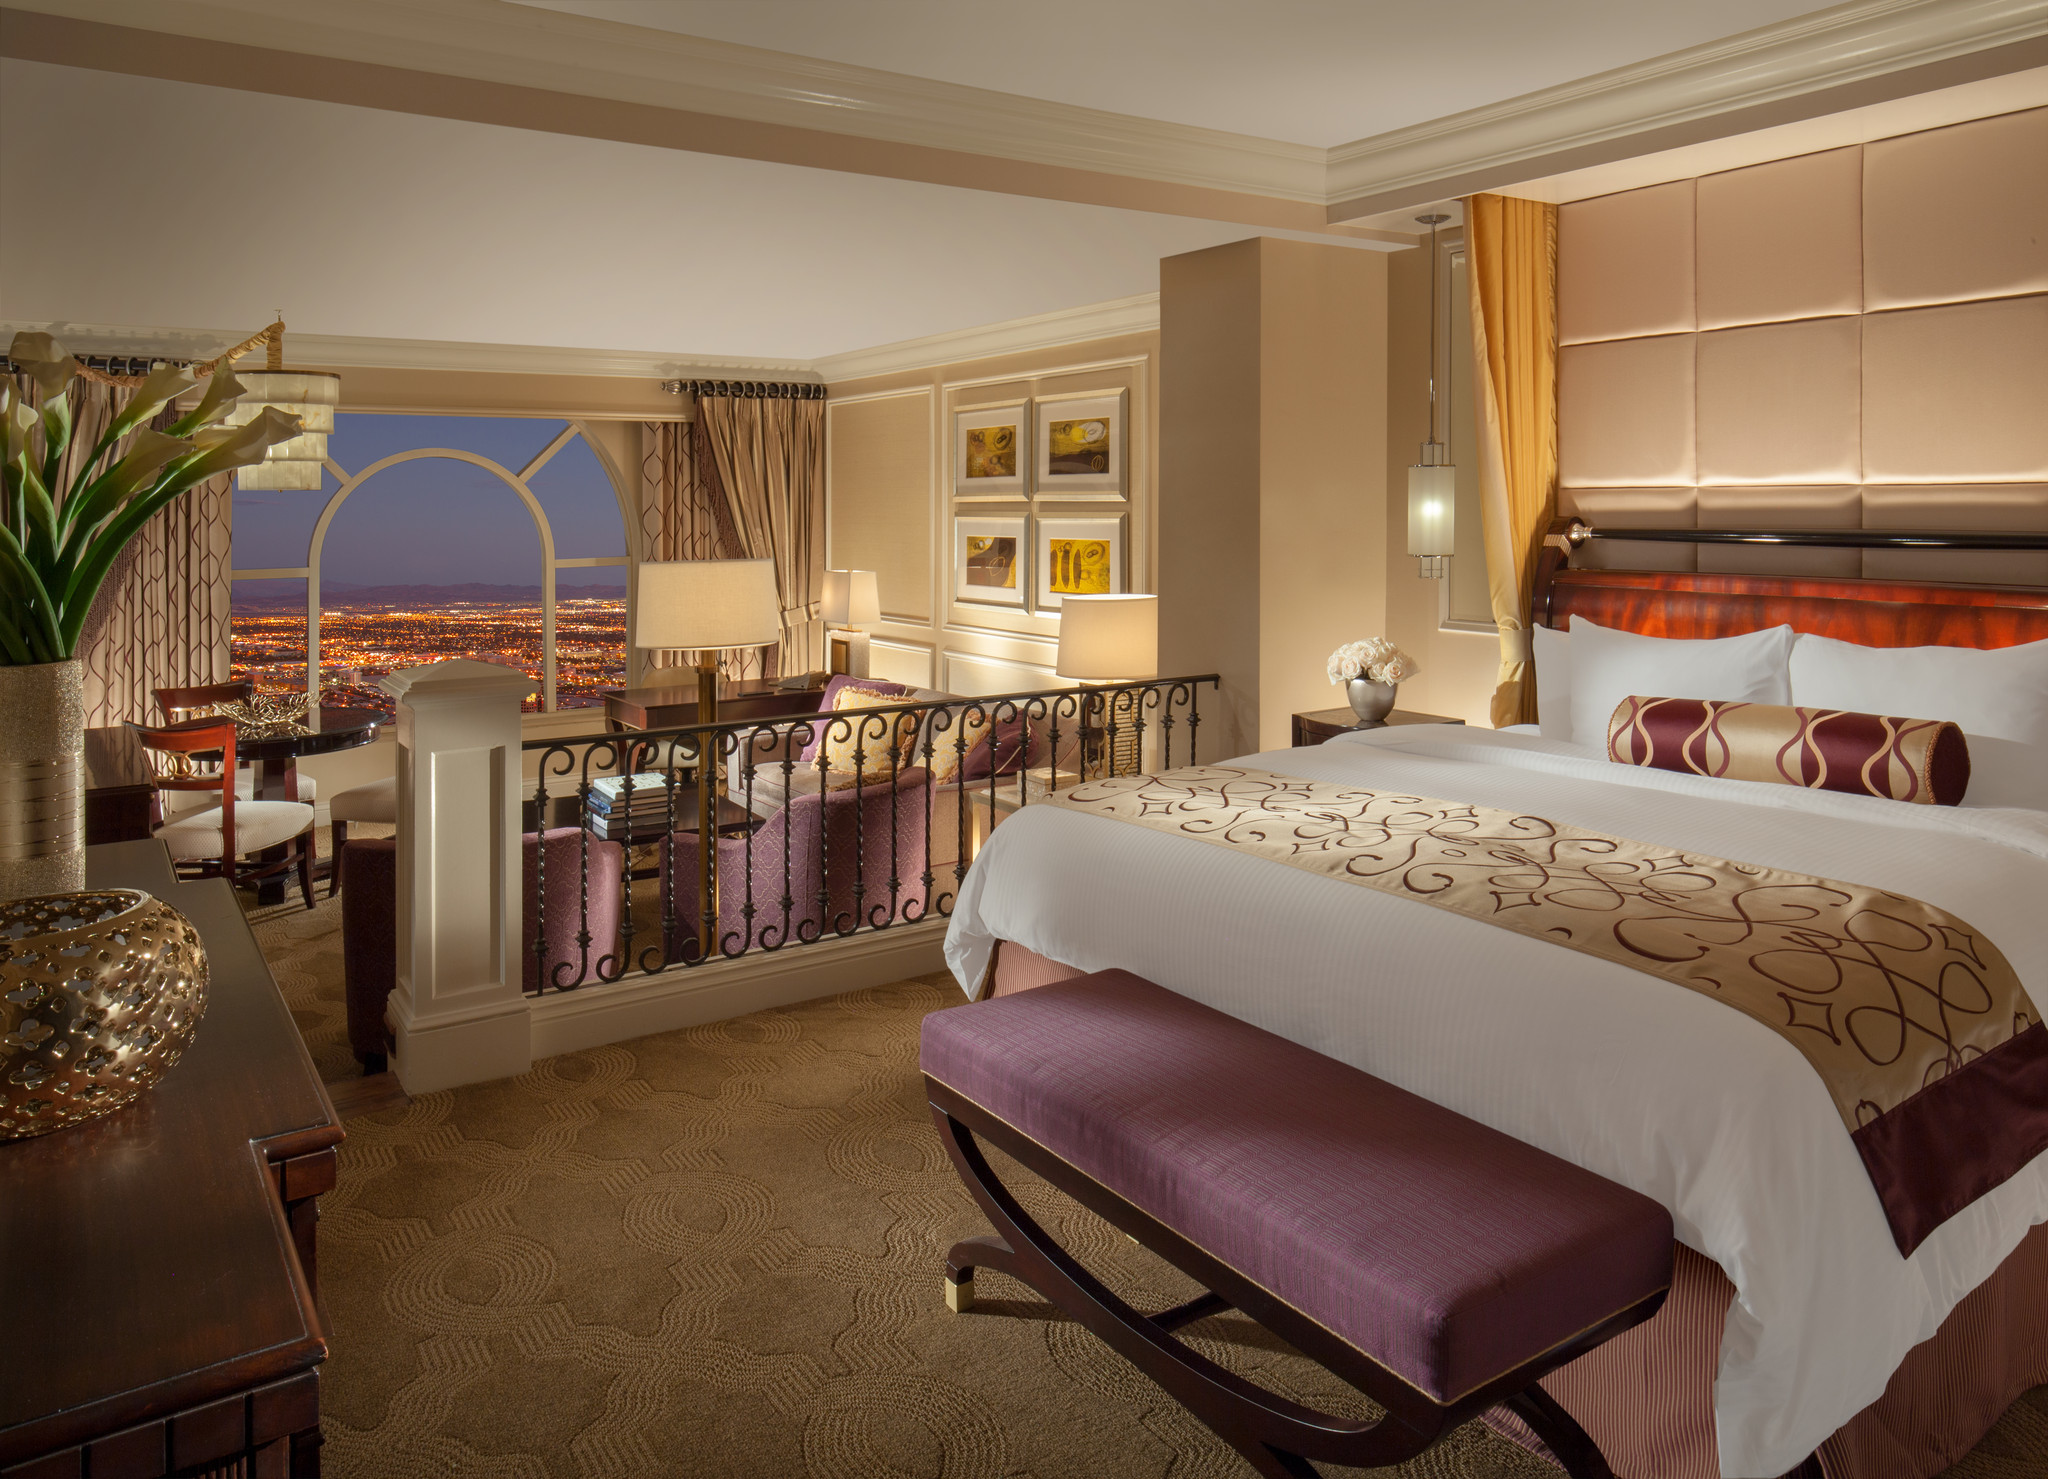 The venetian las vegas hotel deals - Las Vegas Deal 150 Credit For Spring Breakers At Palazzo Or Venetian La Times